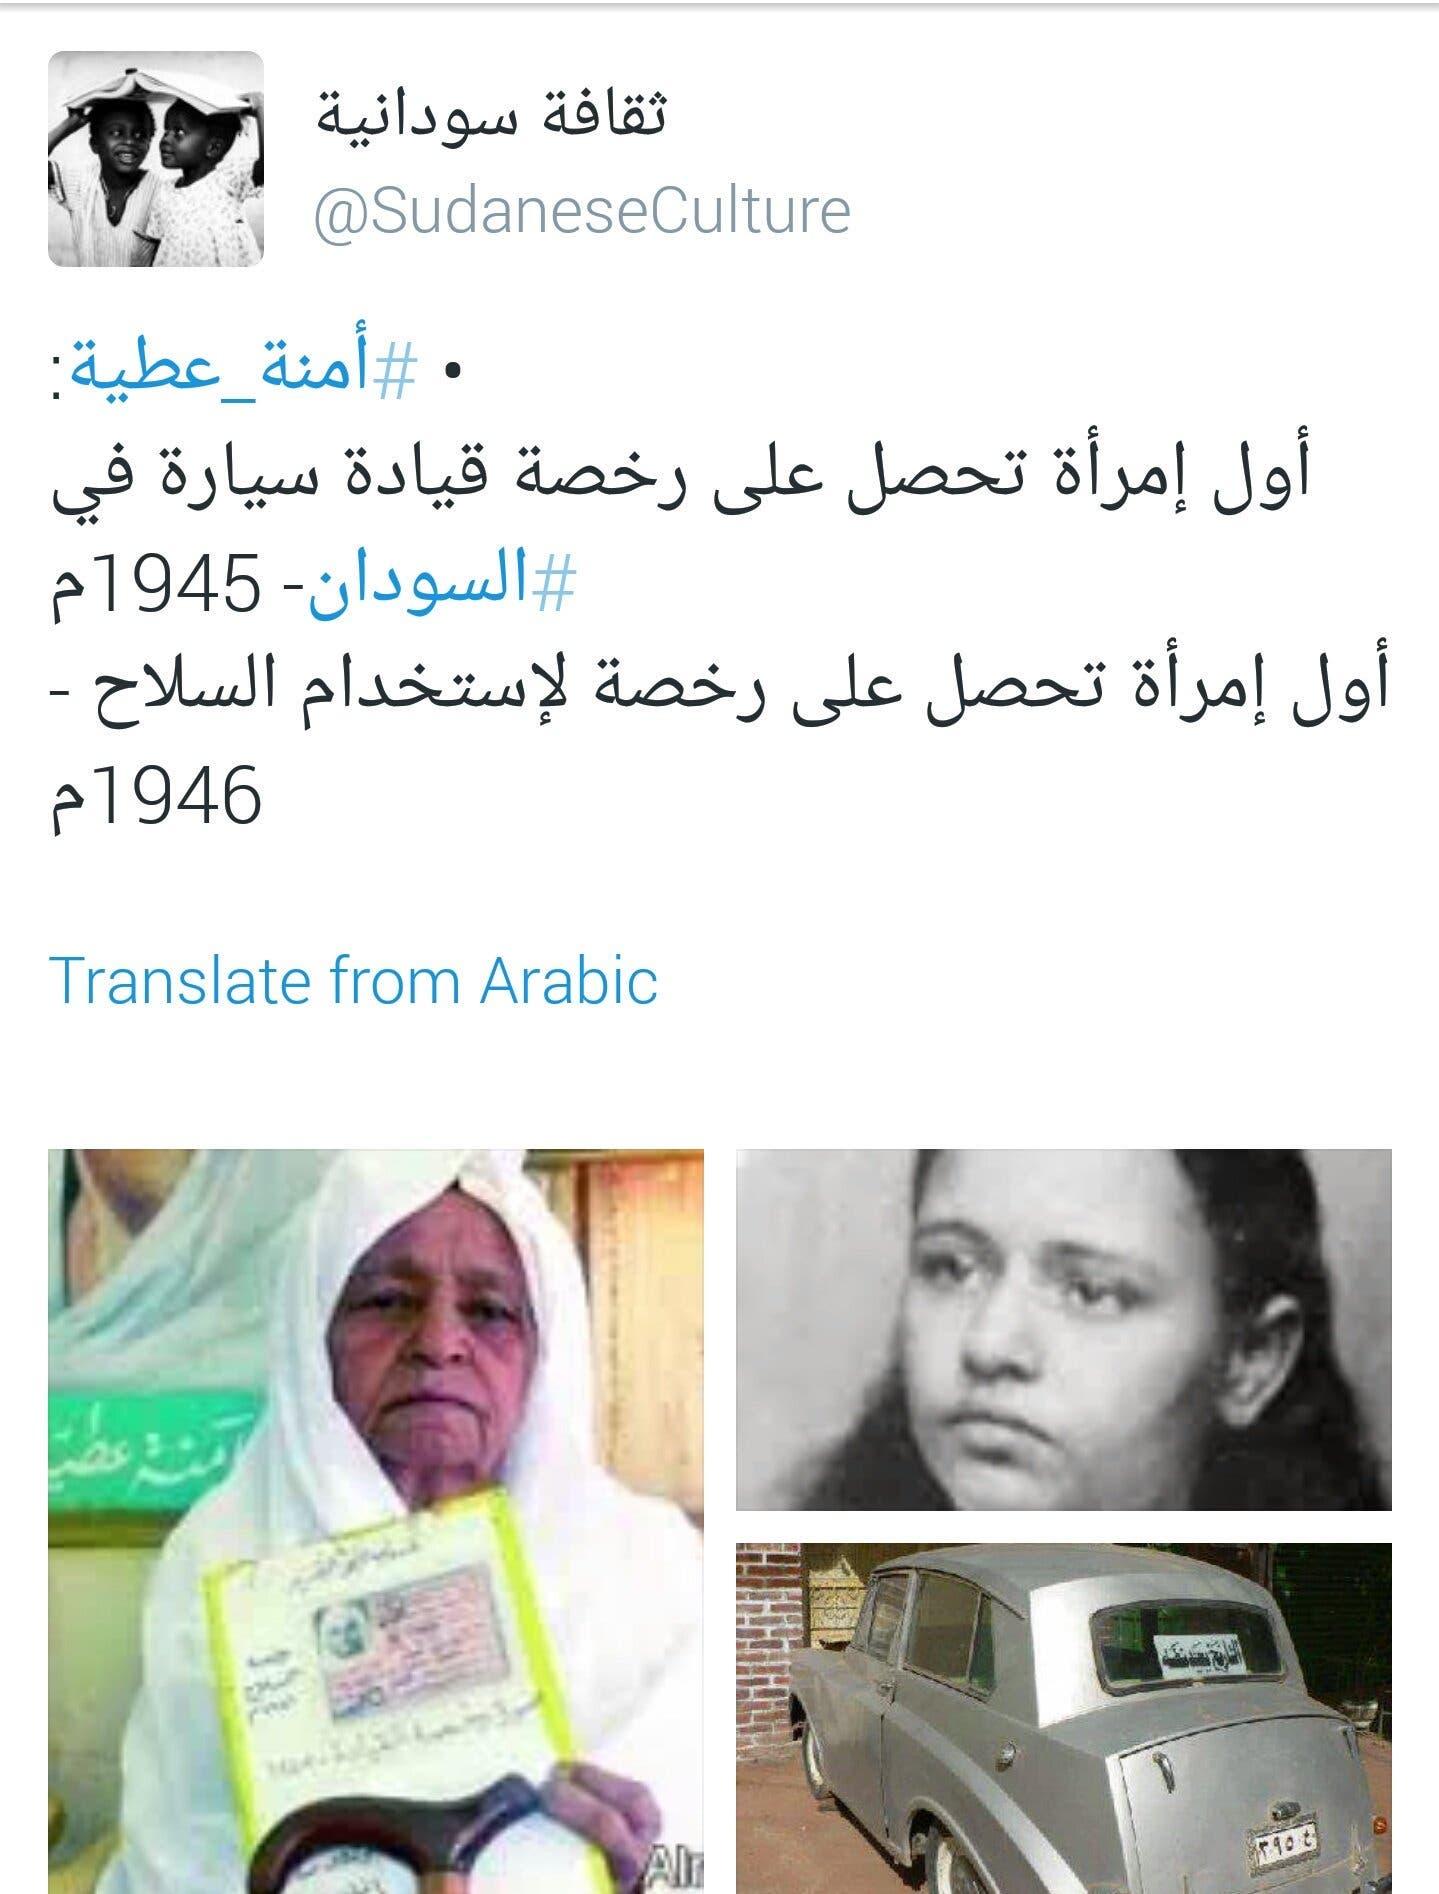 ناشطون سودانيون أعادوا تداول صورتها